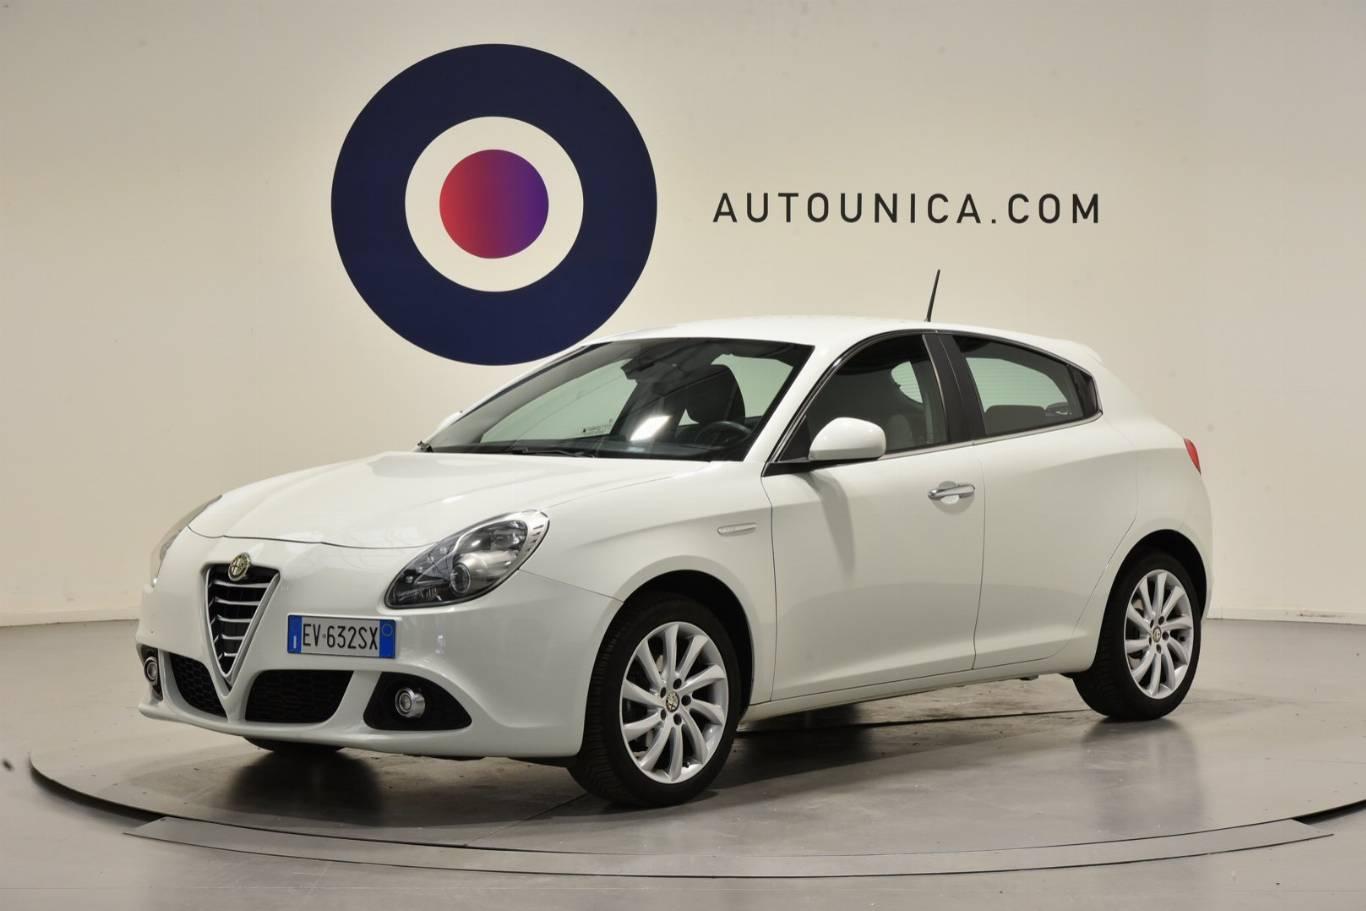 ALFA ROMEO - Giulietta 1.4 TURBO 120 CV GPL DISTINCTIVE